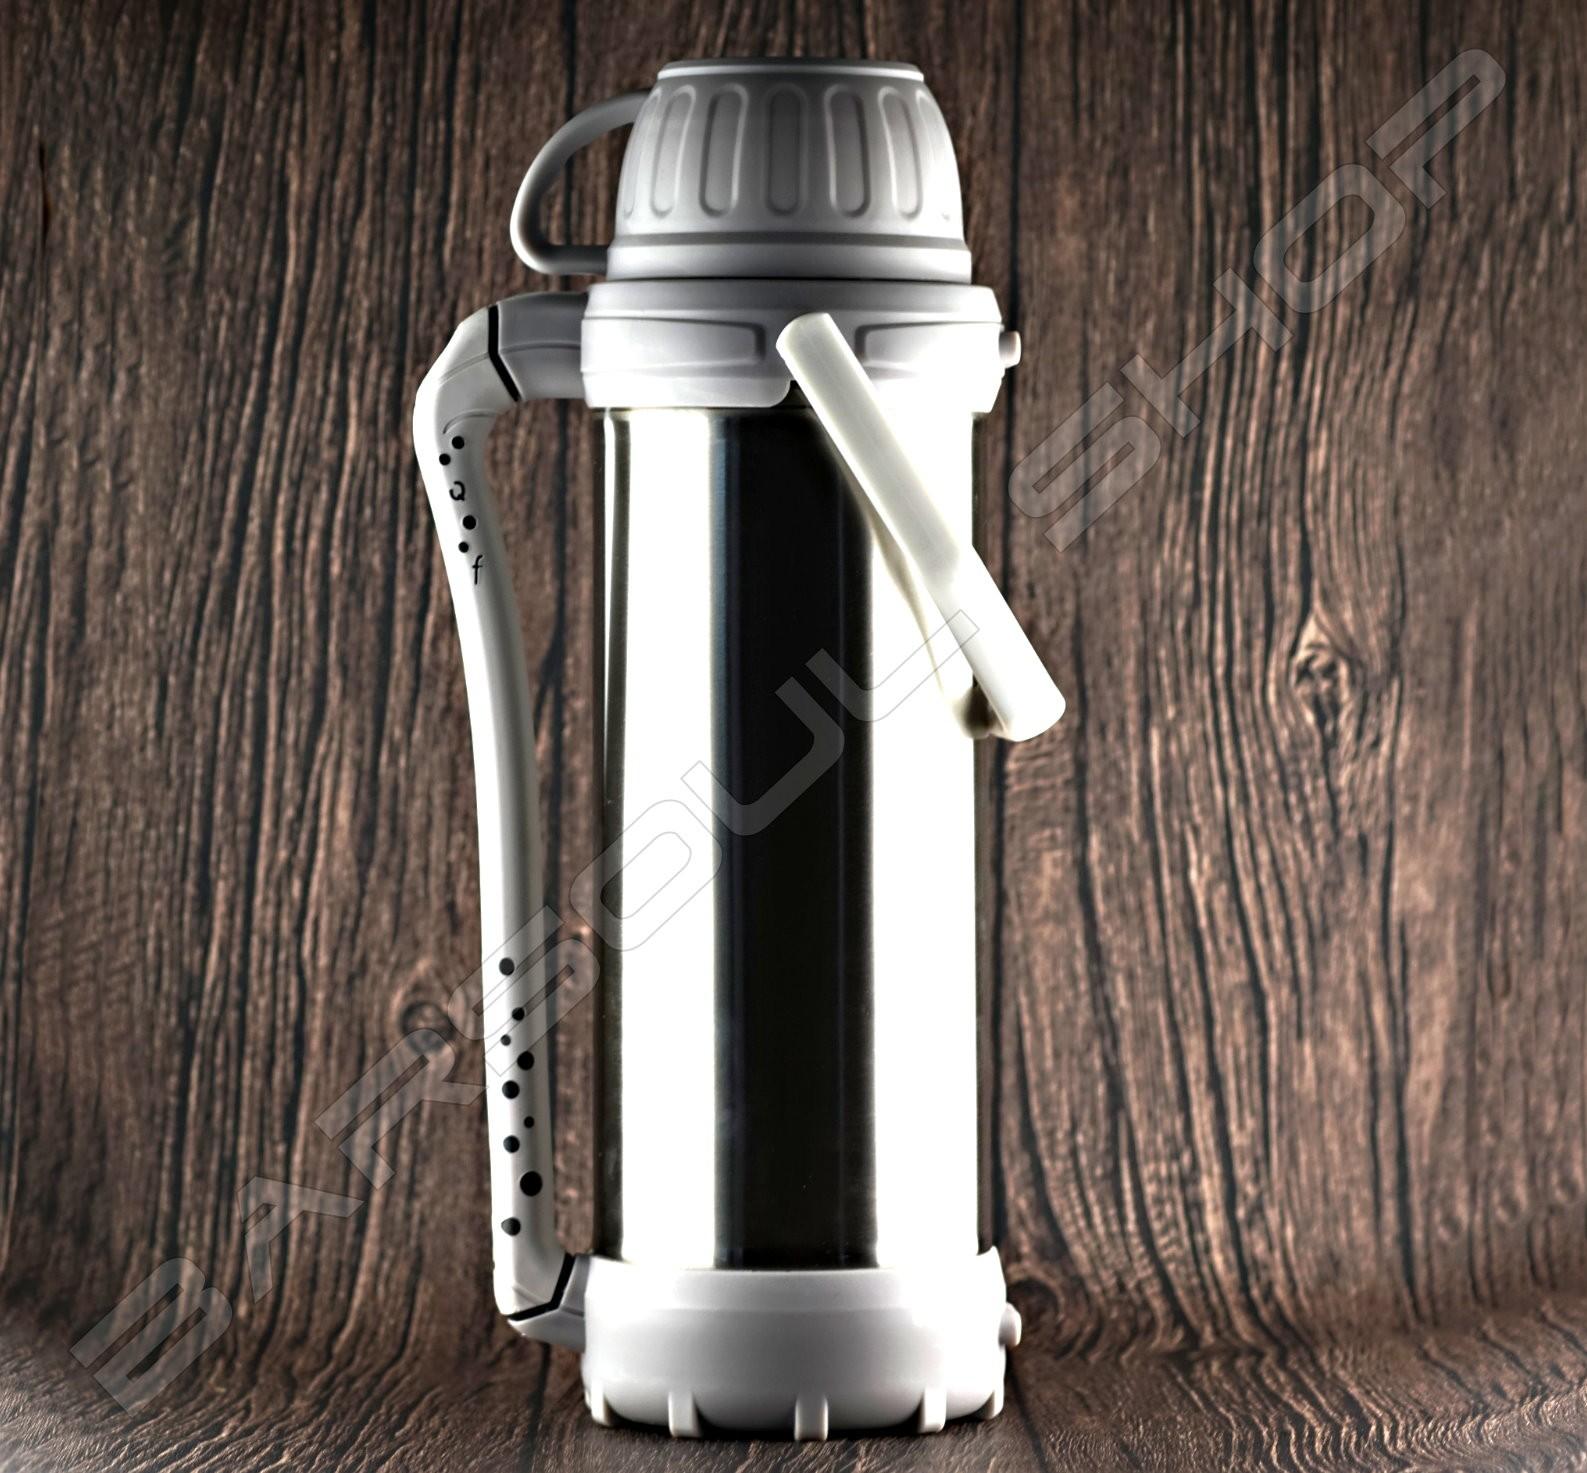 乾冰保冰桶4L(銀) Dry ice paul ice bucket(silver)